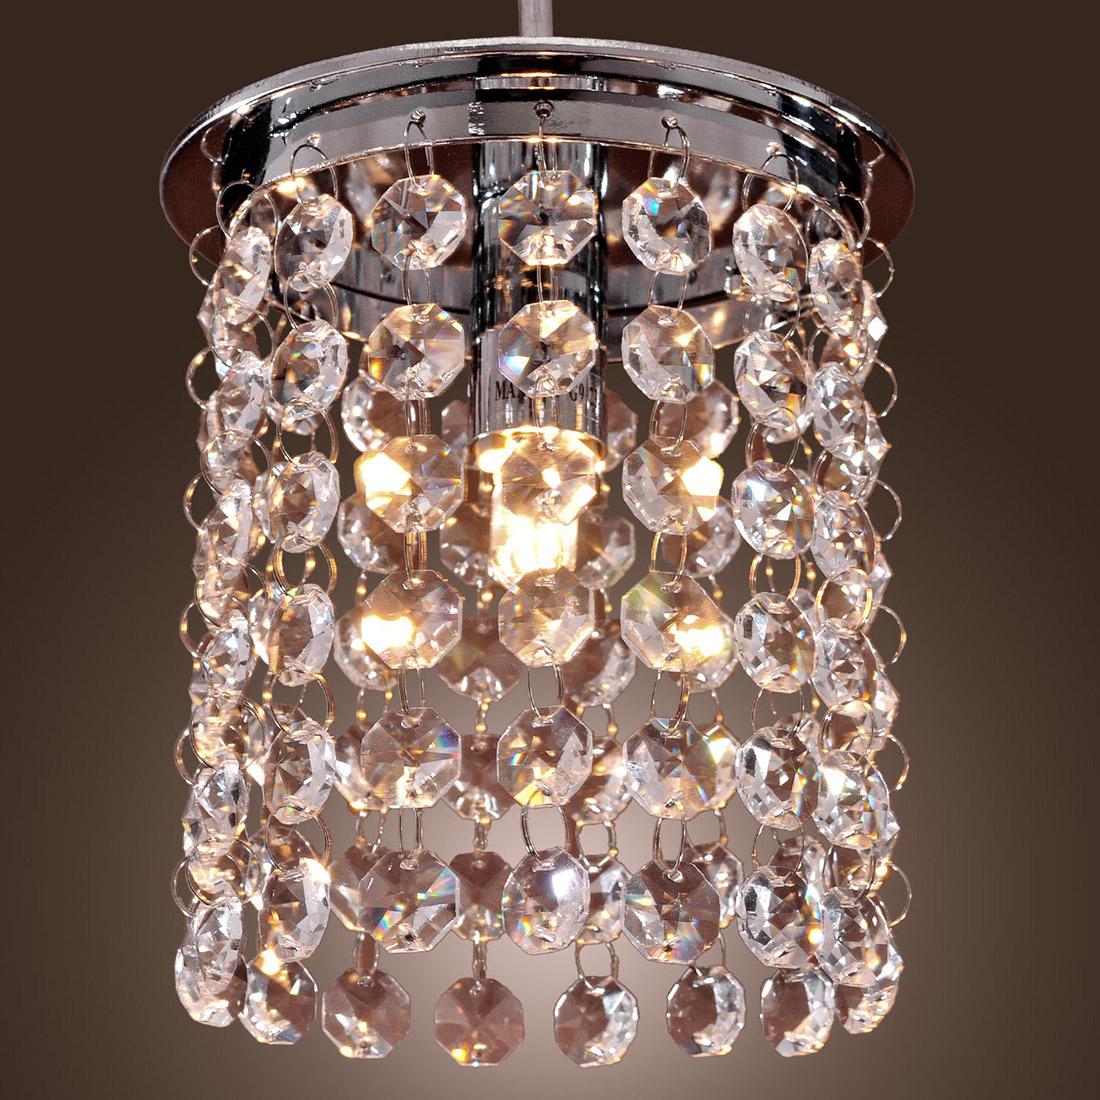 Crystal Ceiling Light Modern Chandelier Pendant Kitchen